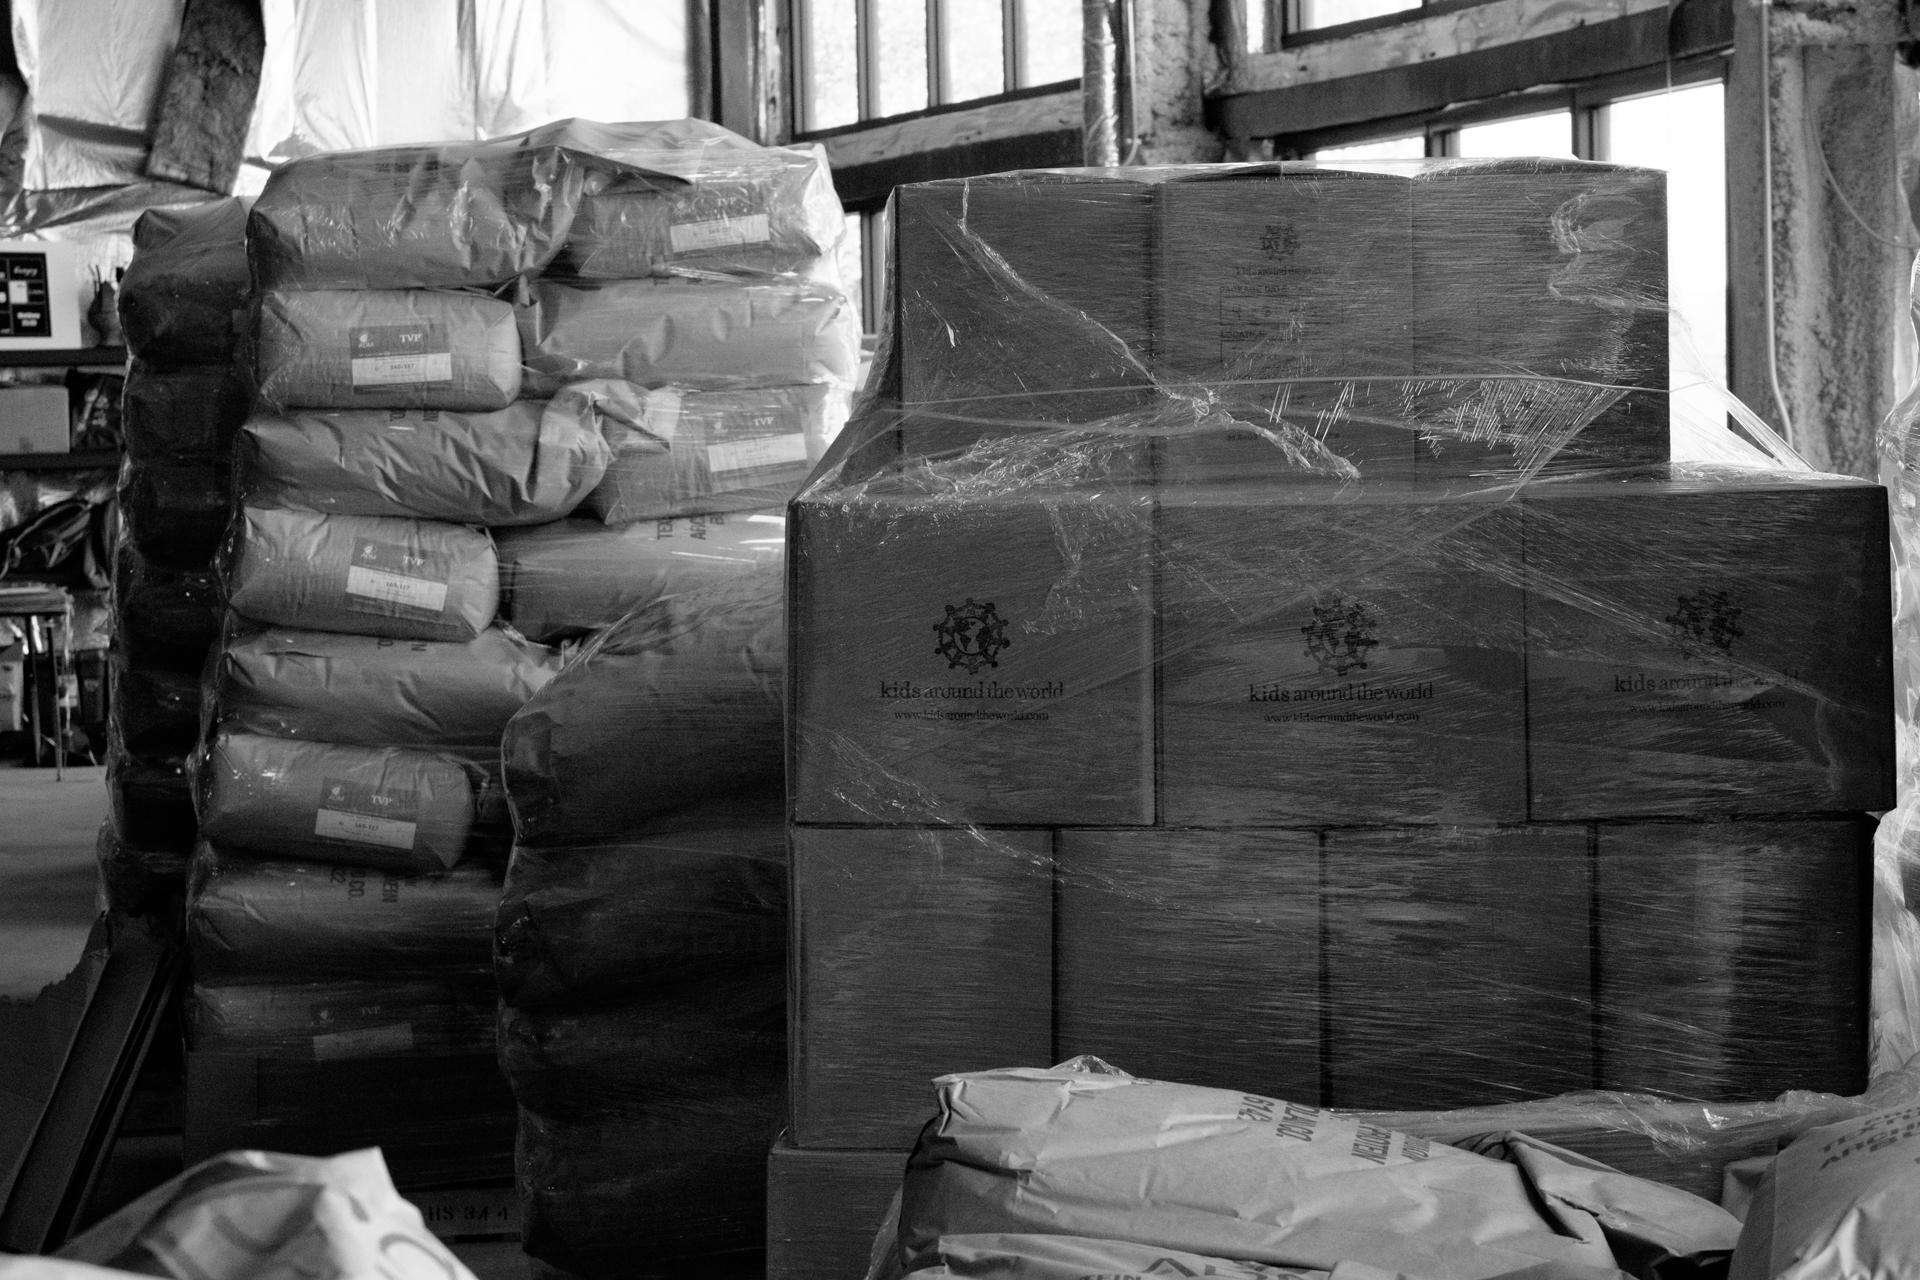 Humanitarian-food-packing-19.jpg